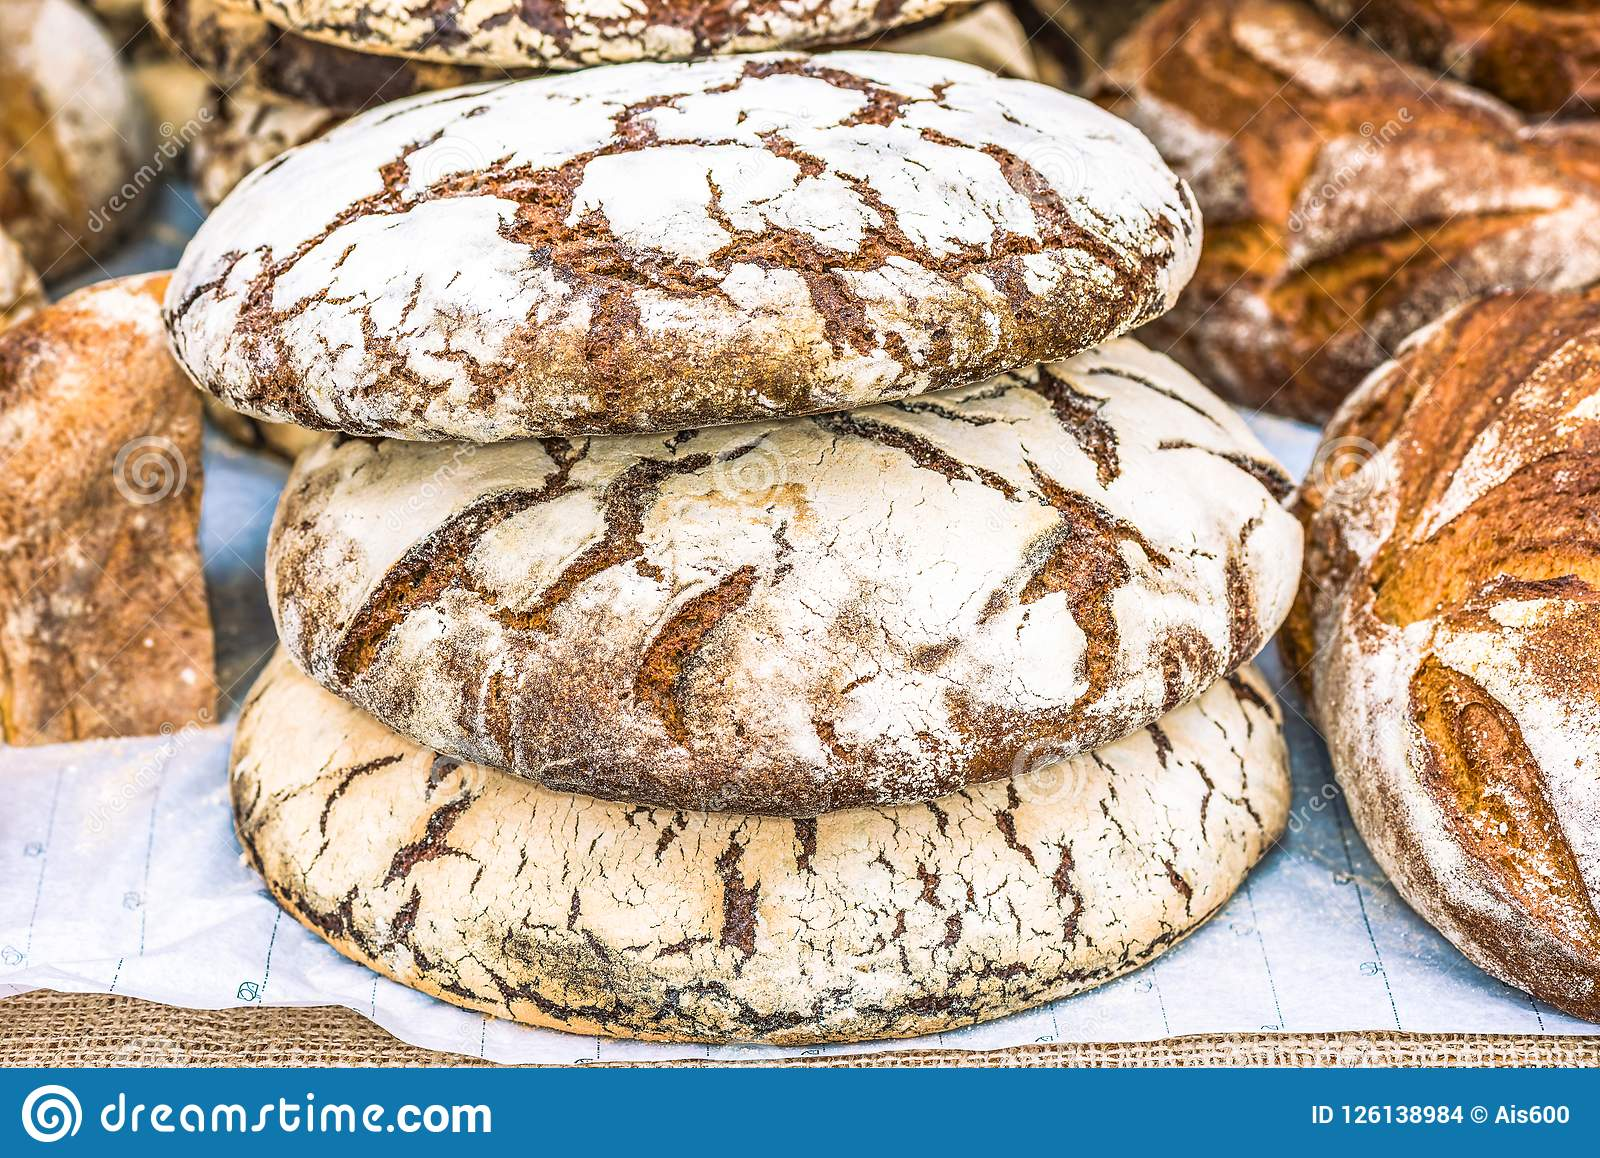 Round loaves of wheat bread on the table, Kiev, Ukraine.